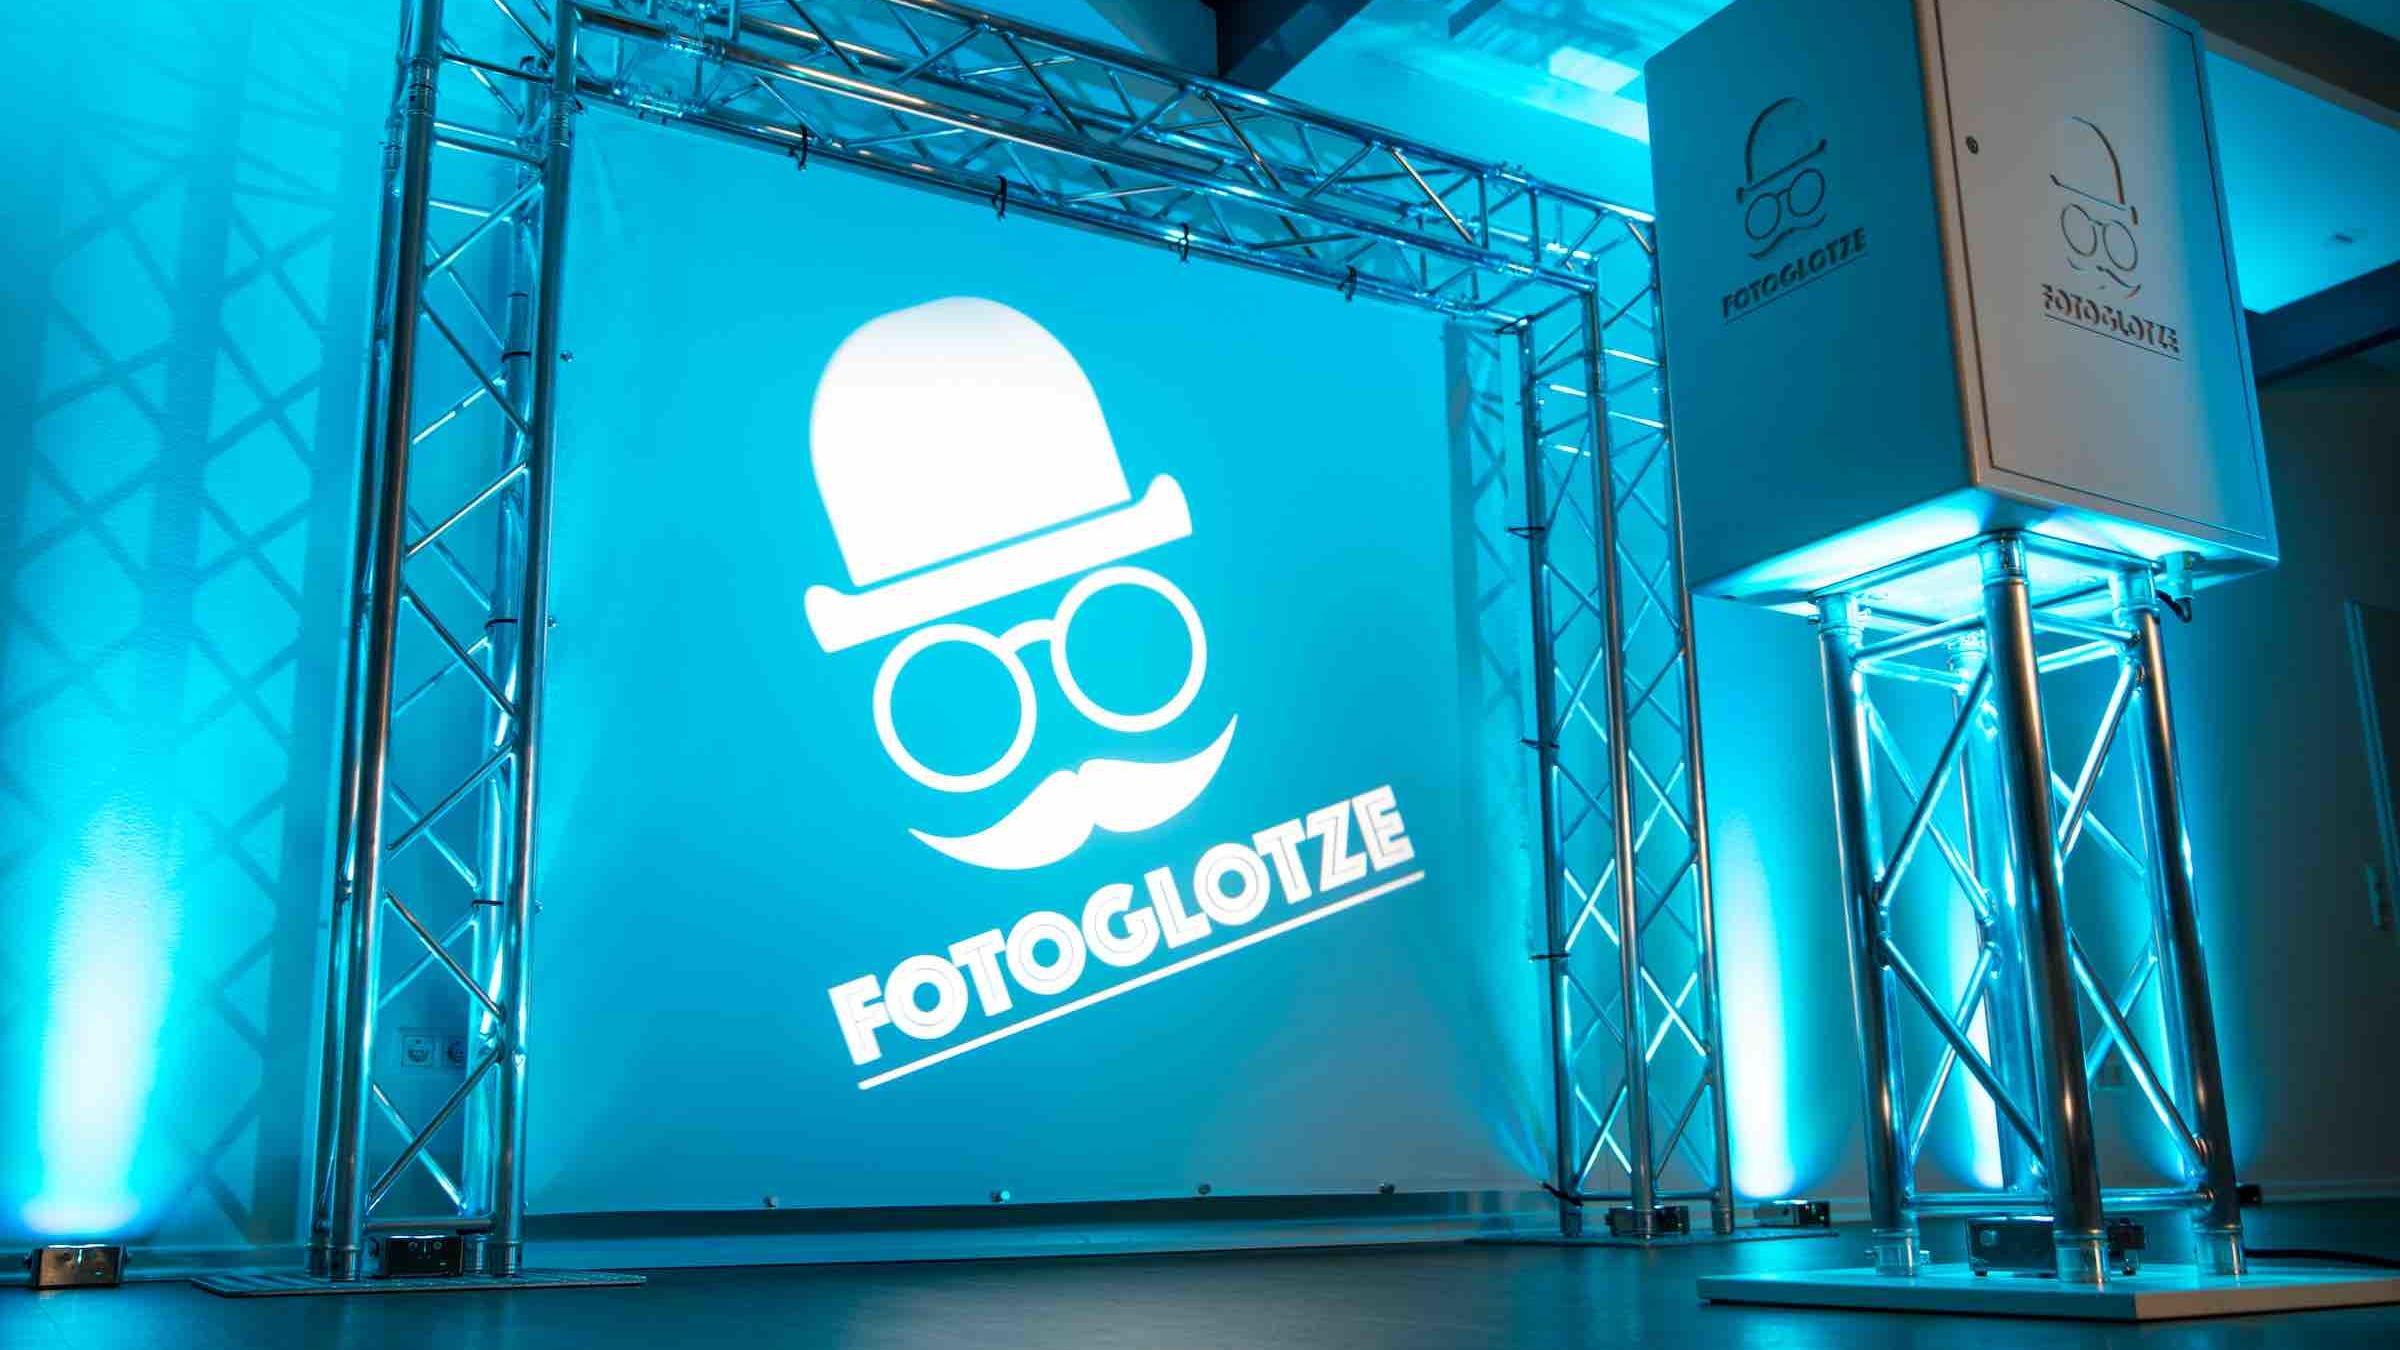 Partner | Barformat | Fotoglotze | Fotobox | Photobooth | Fotoautomat | Hannover | Mieten | Buchen | Anfragen